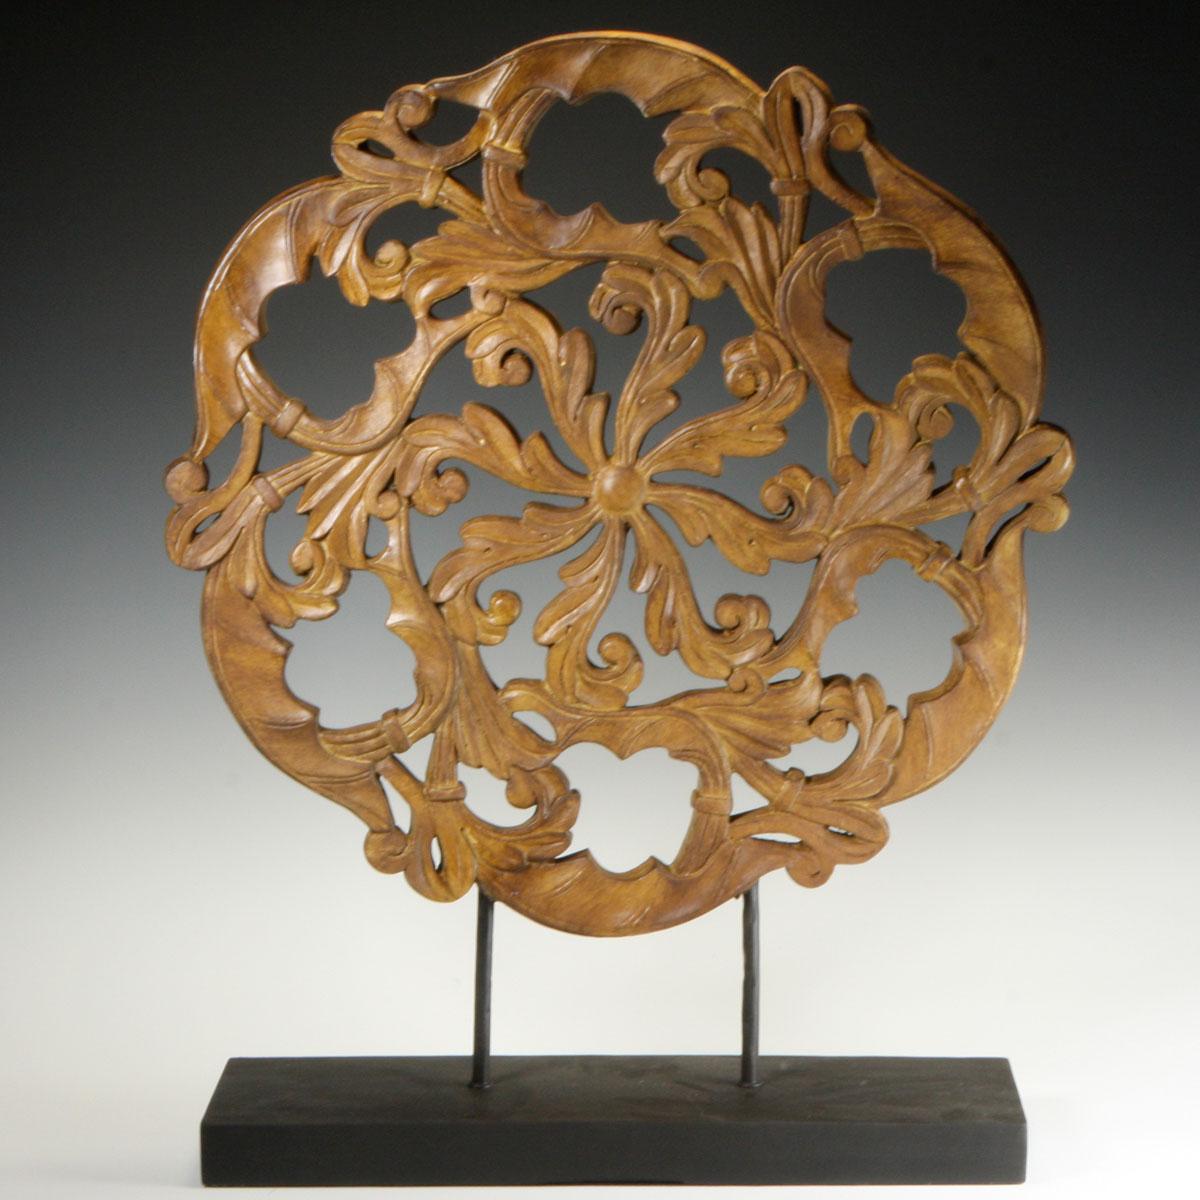 Wood carving inakraf